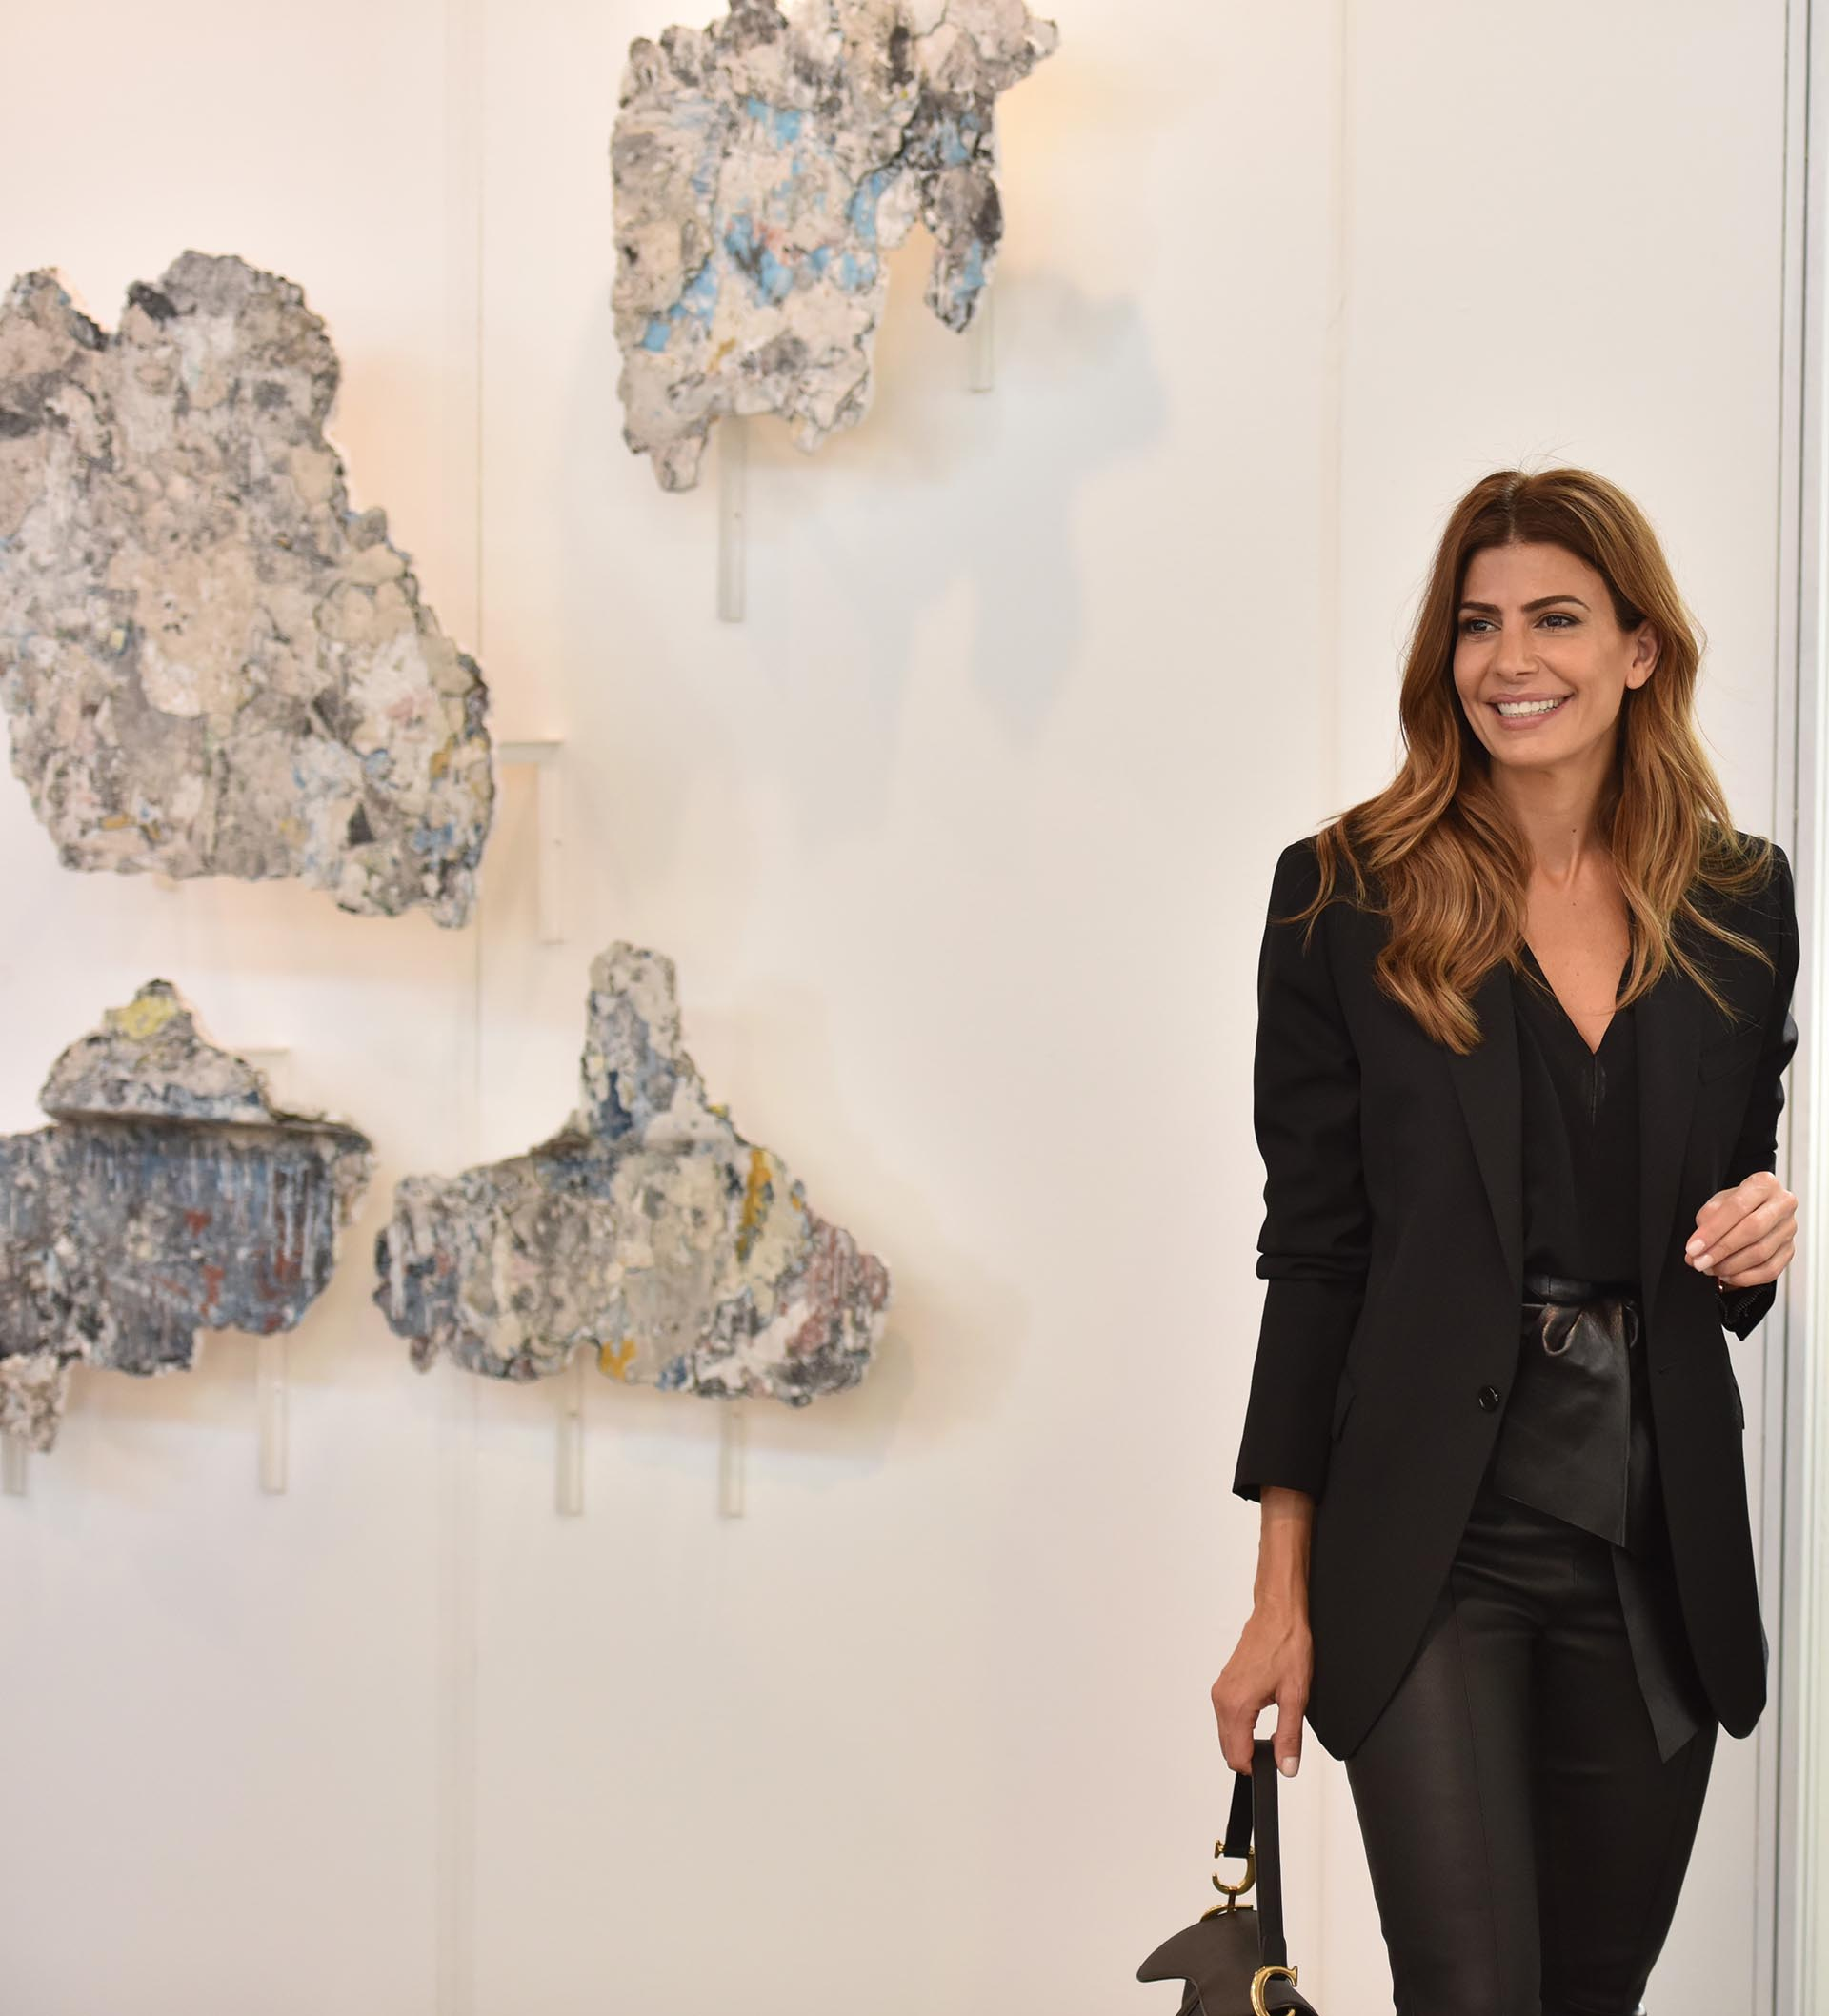 Juliana Awada durante su recorrido por arteBA